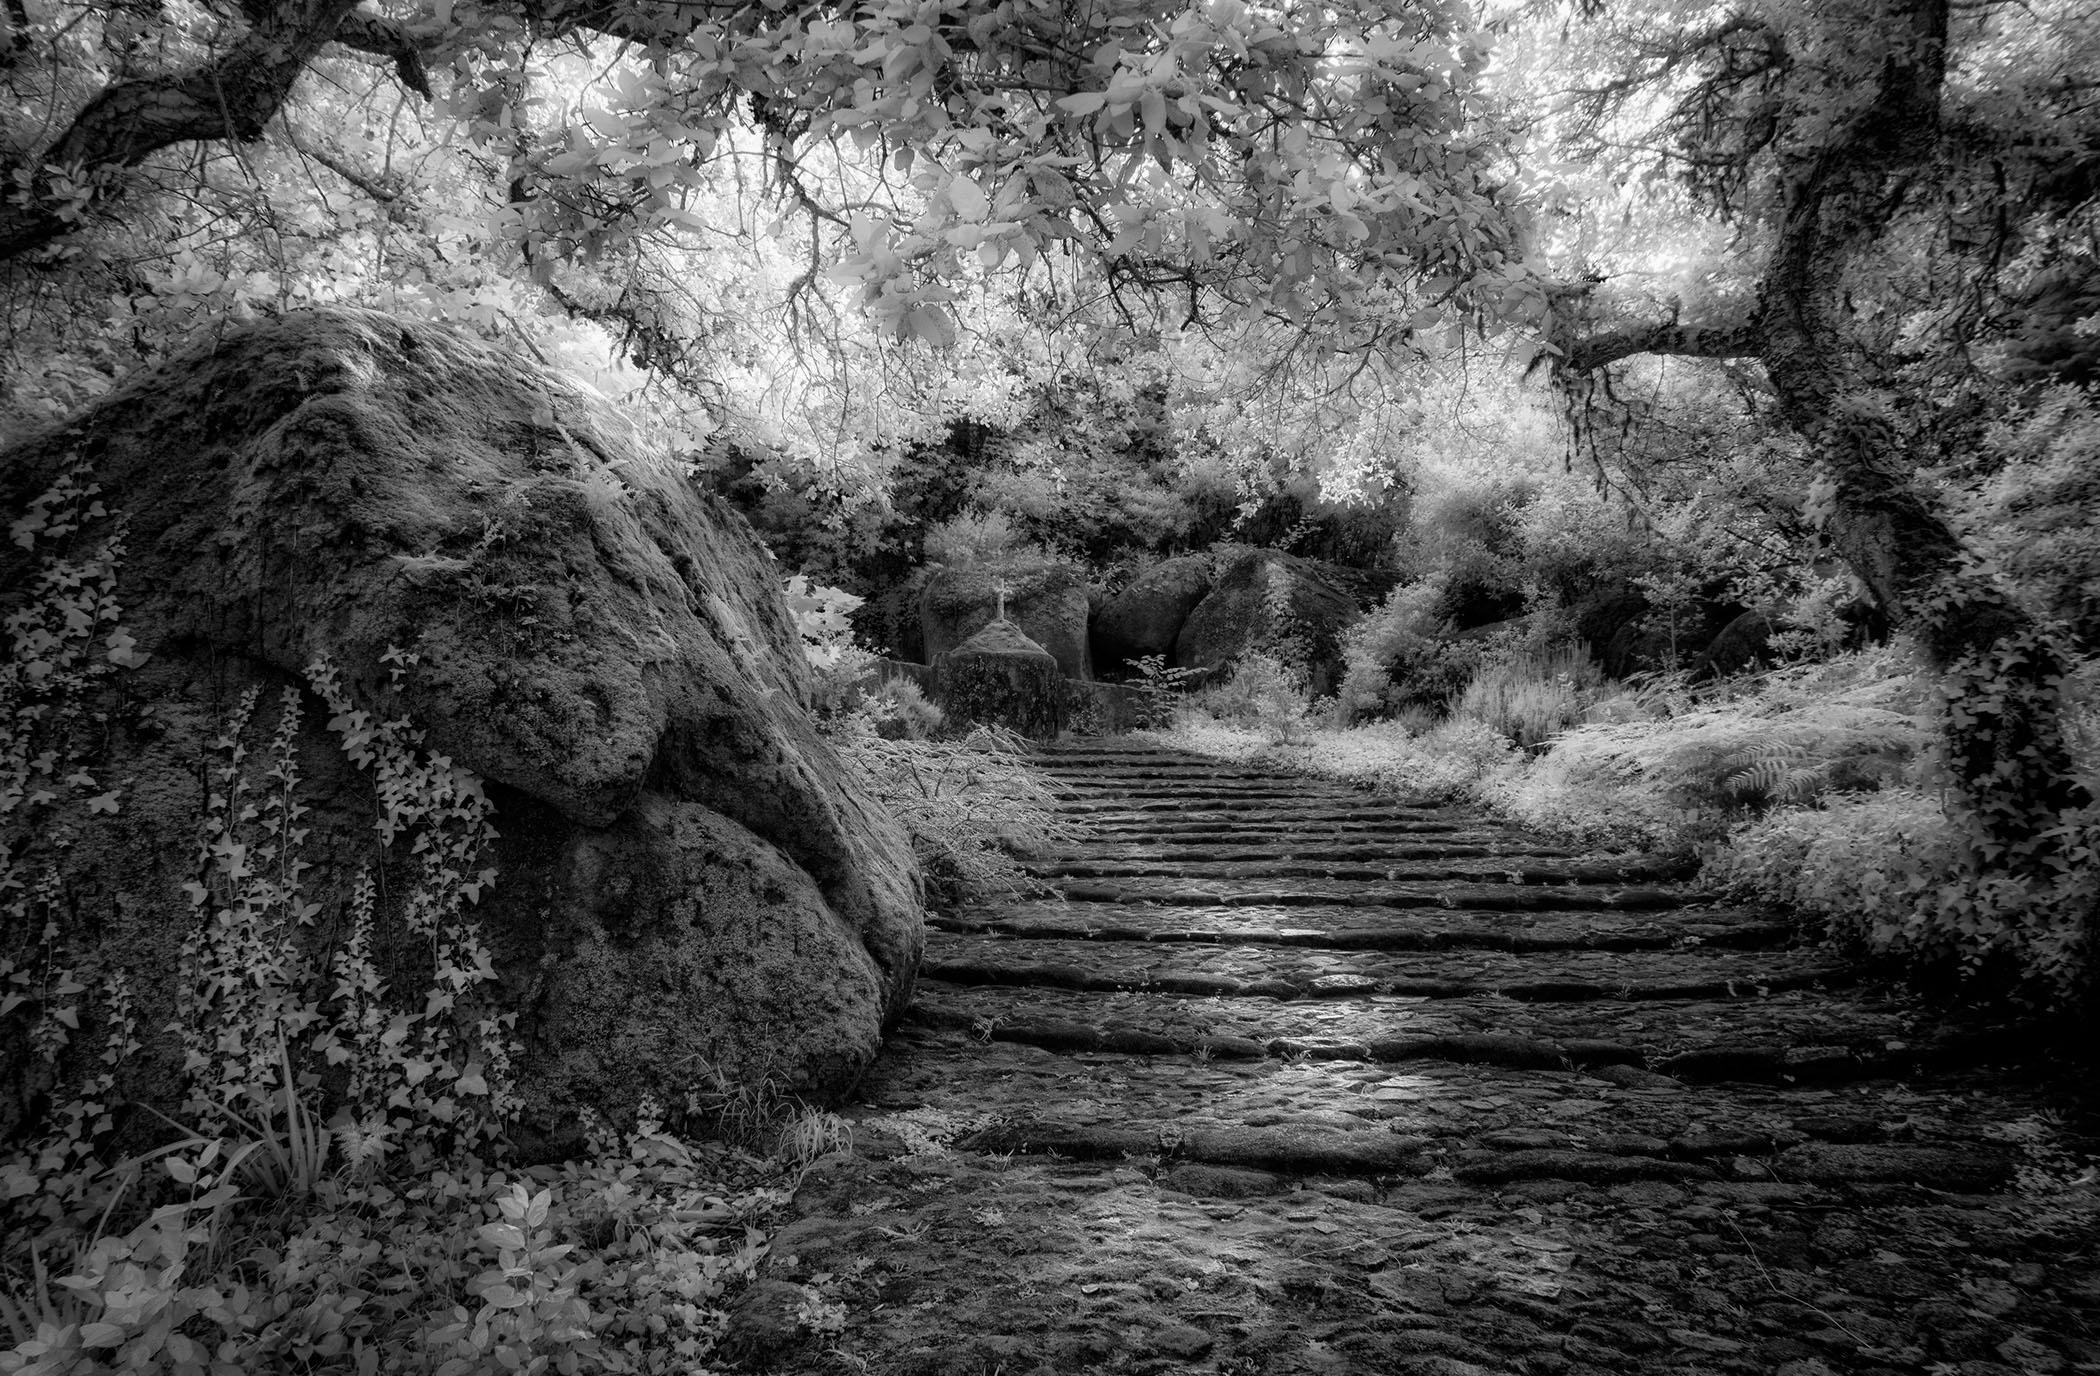 20496934-RondaAnderson_Jeronimos Monastery_Photography14.5x9.25_100_2017.jpg